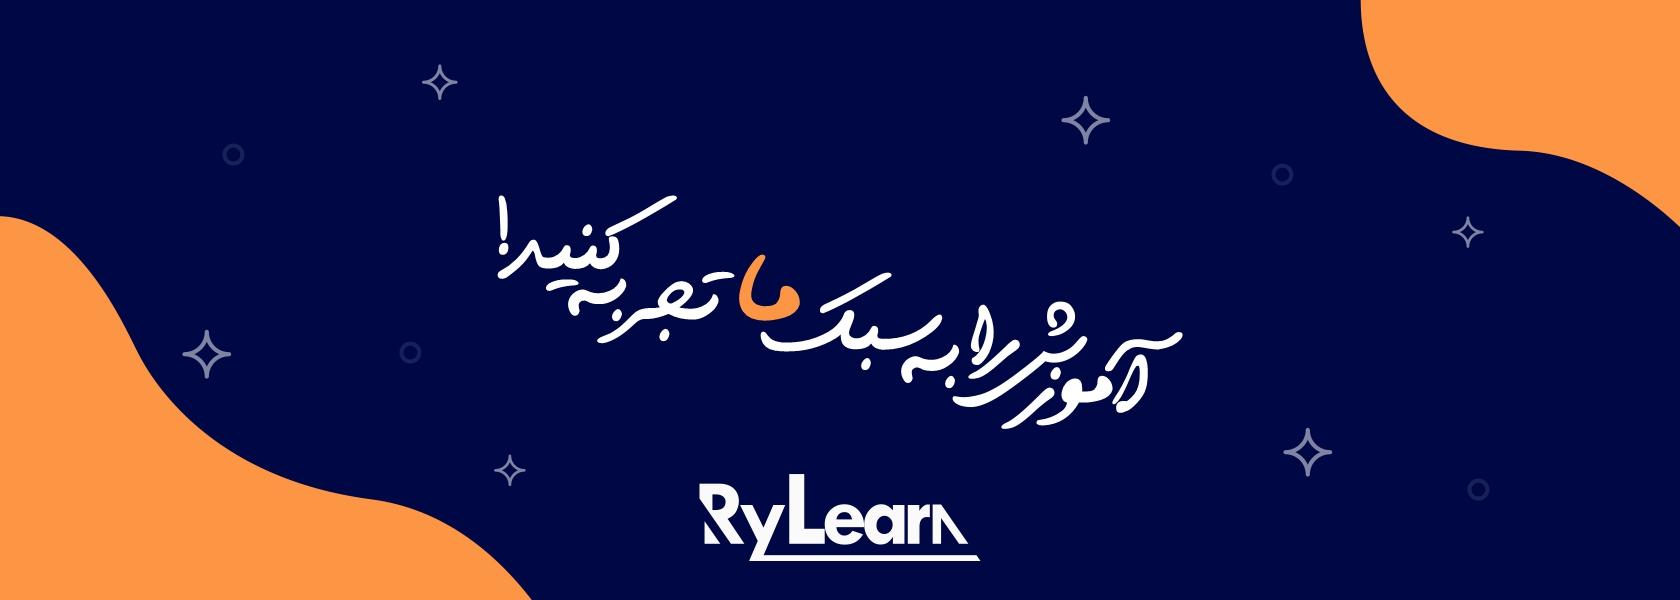 اسلایدر شعار جهاد